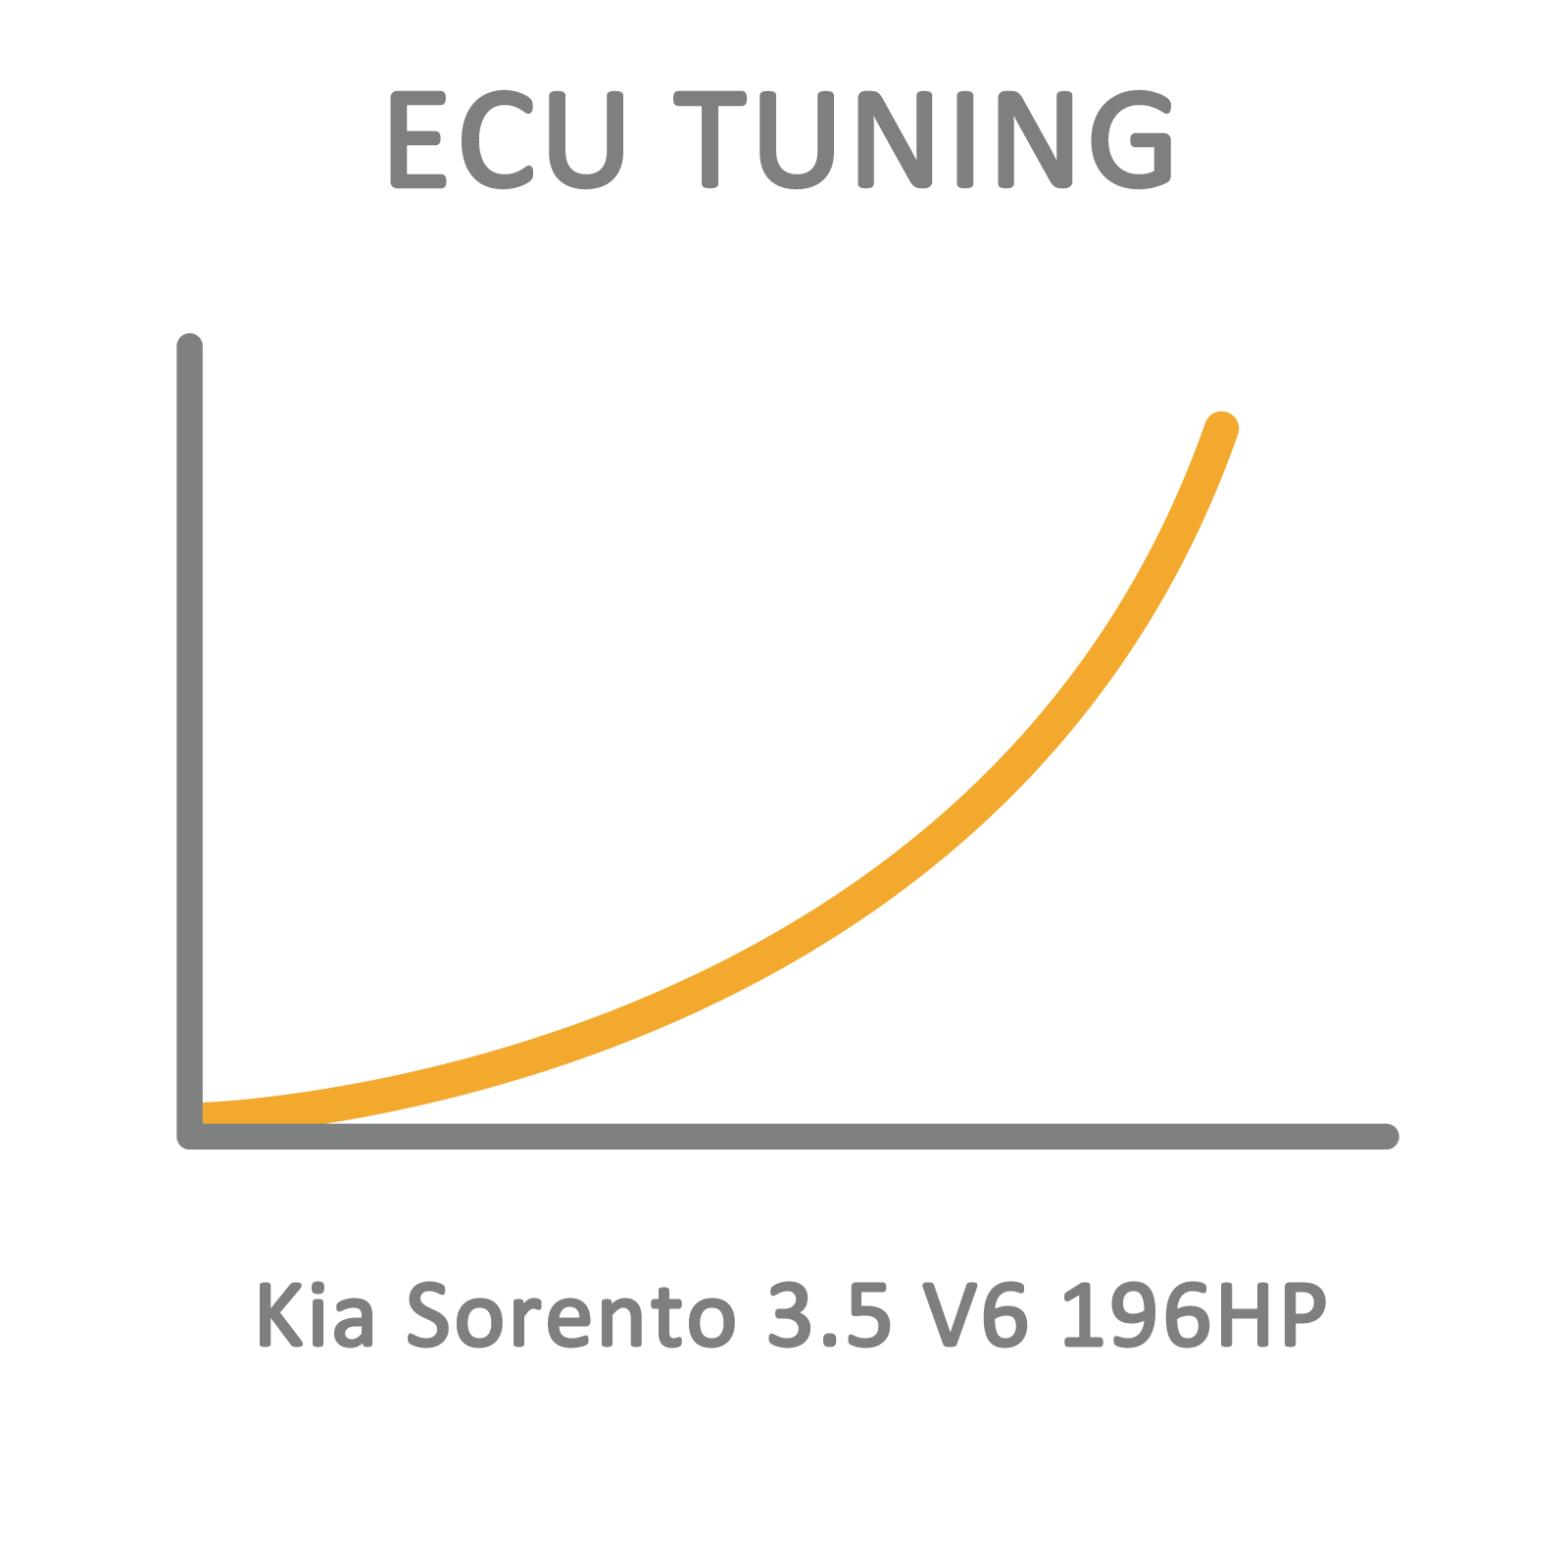 Kia Sorento 3.5 V6 196HP ECU Tuning Remapping Programming